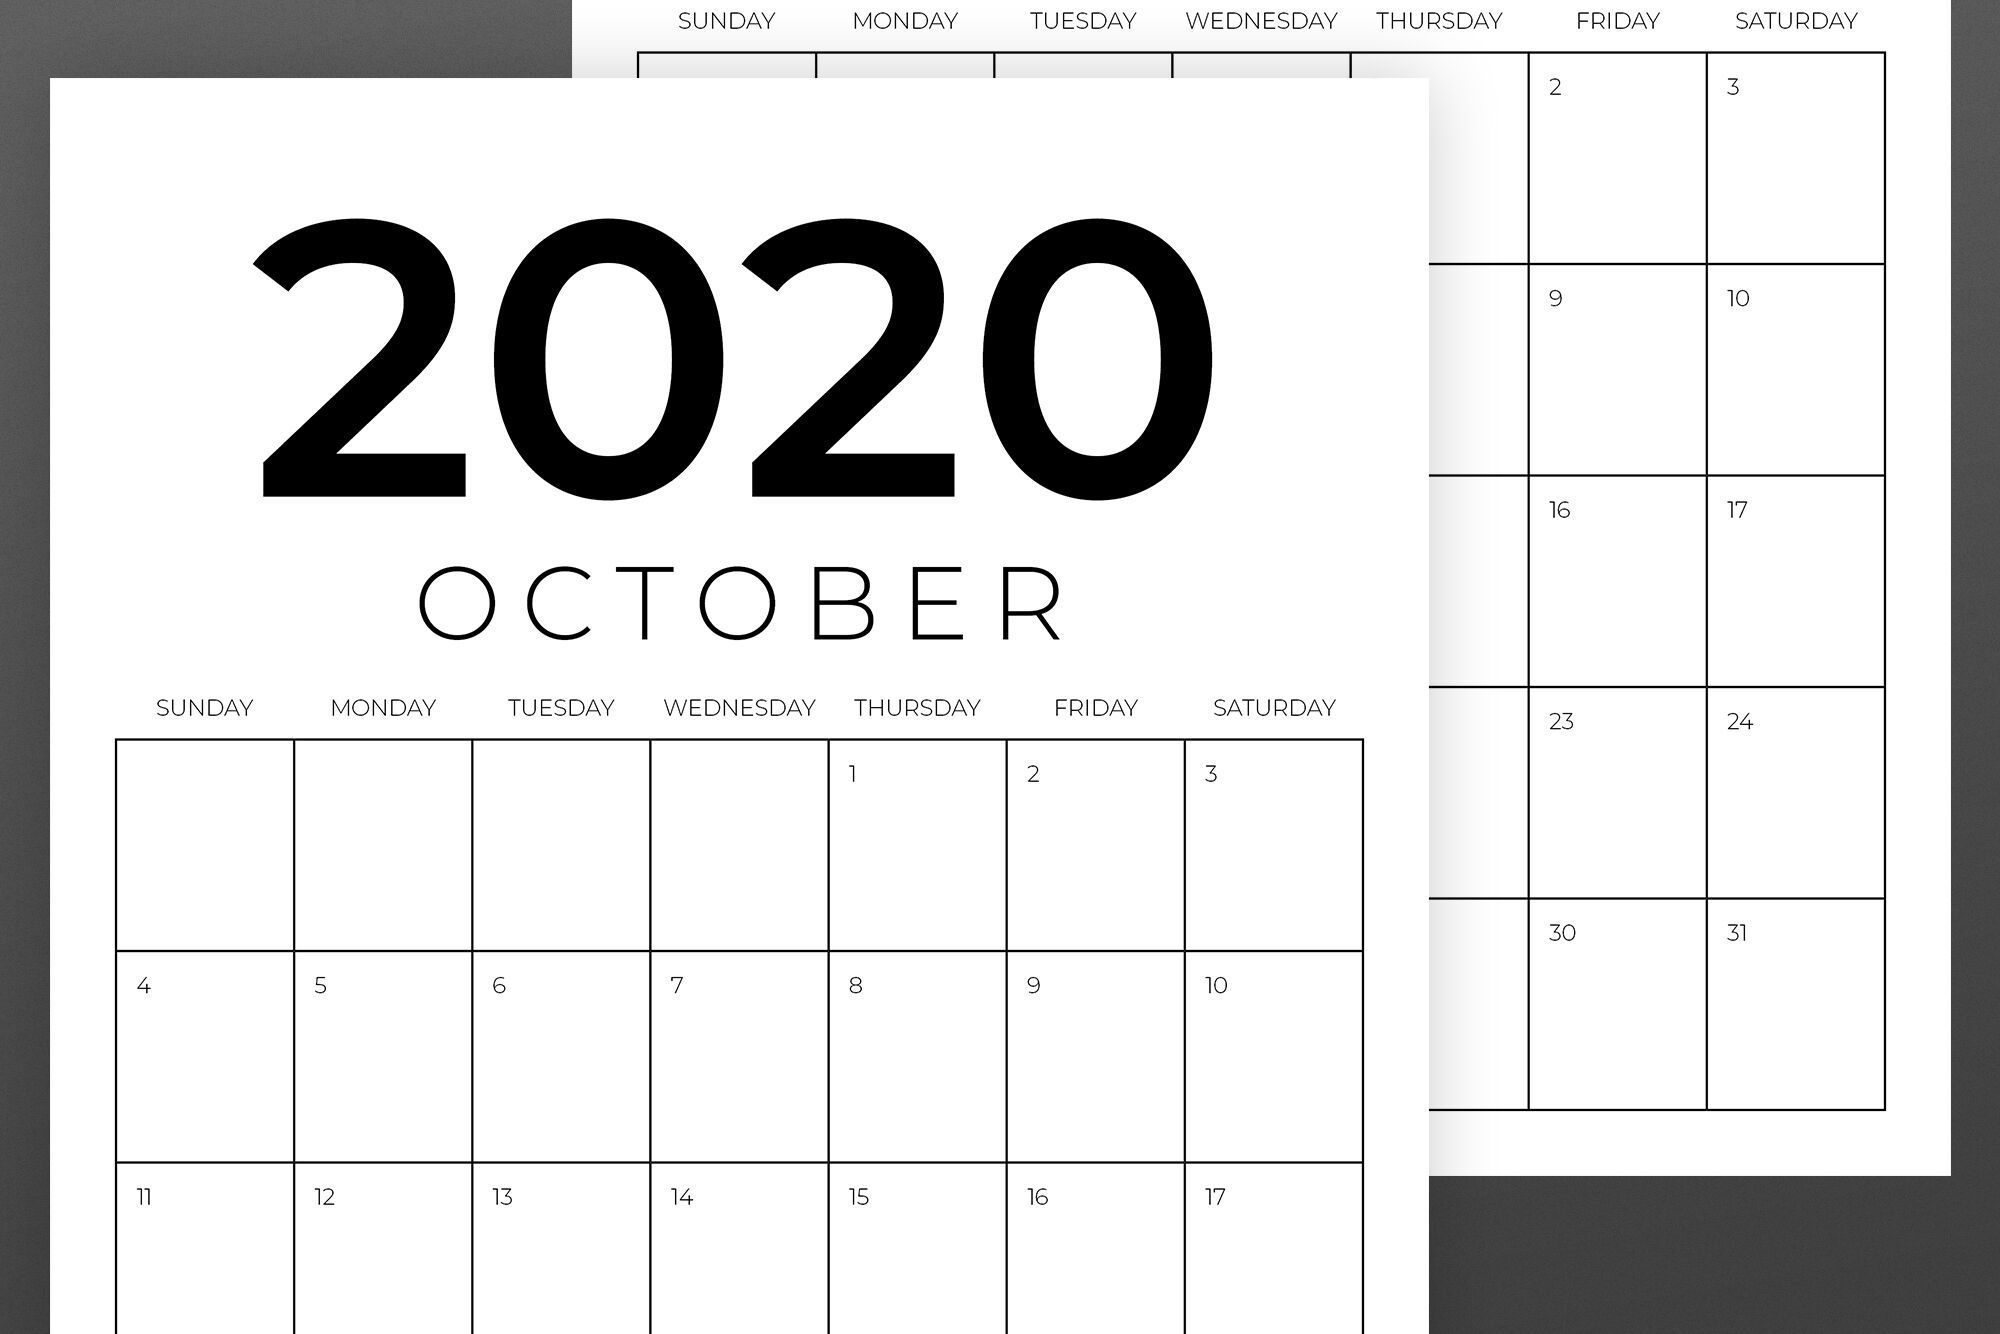 effective 8 5 x 11 printer friendly calendar   get your